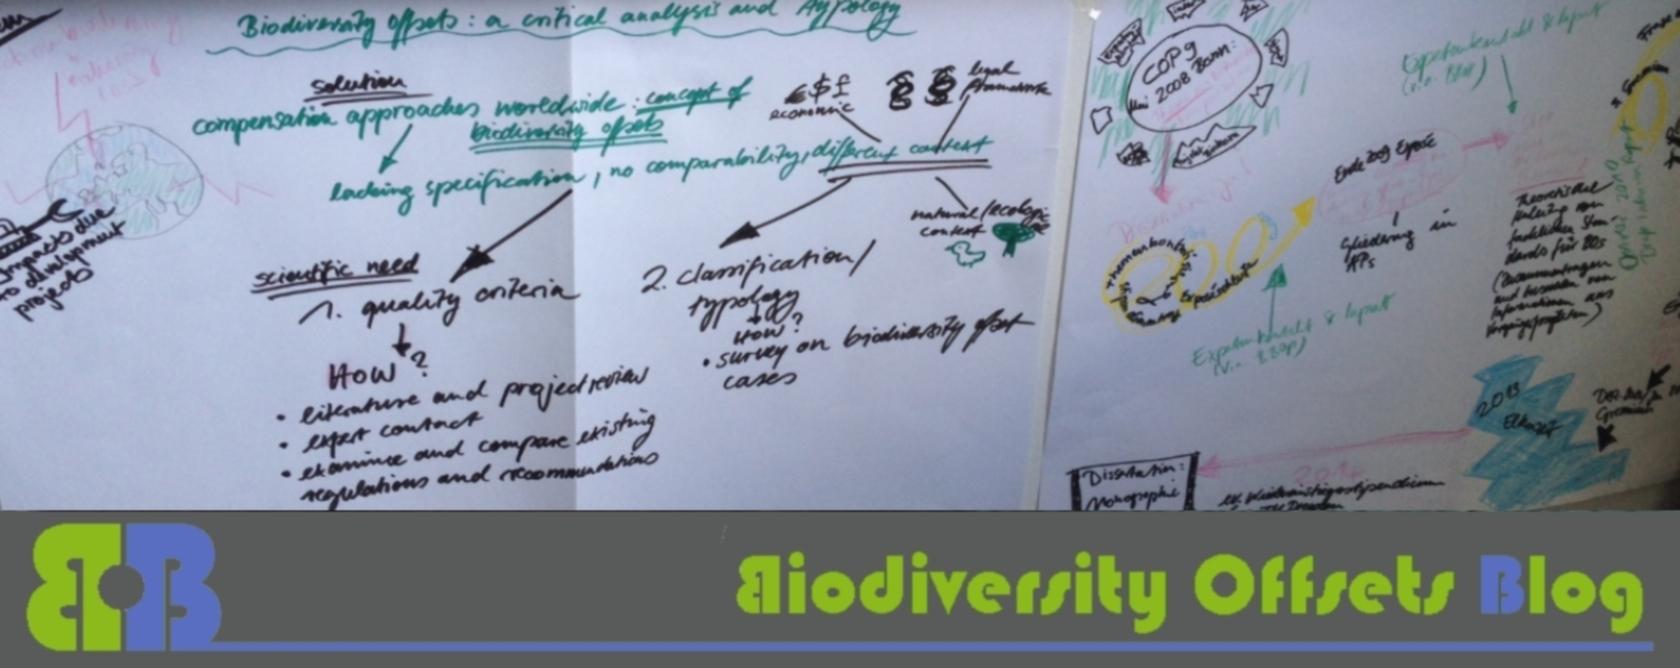 Biodiversity Offsets Blog Logo_hellgruen_PhD2_1680